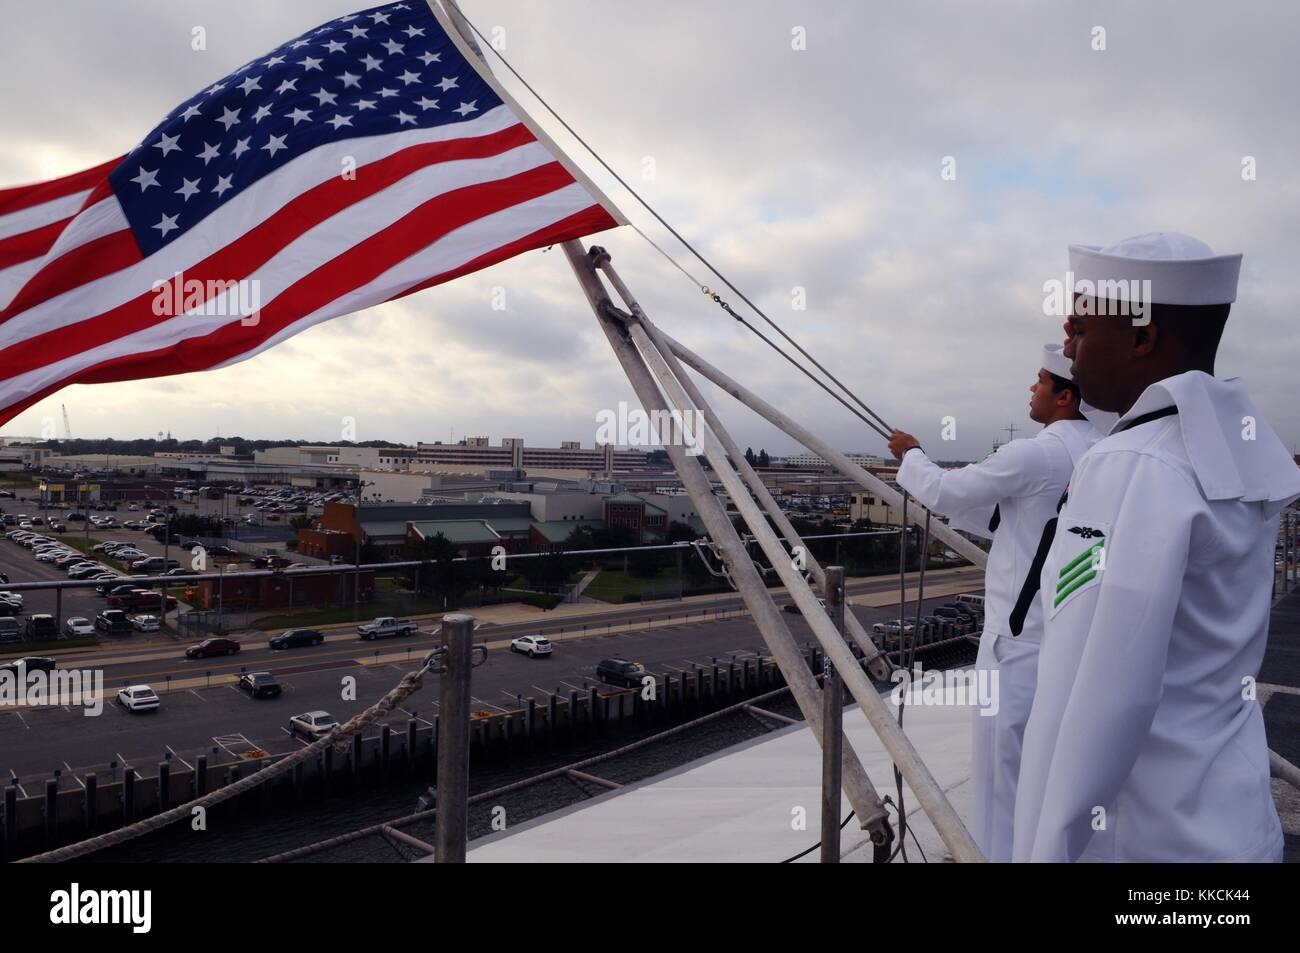 Aviation Boatswain's Mate Handling Airman Jackie L Chess, right, salutes as Aviation Boatswain's Mate Handling - Stock Image